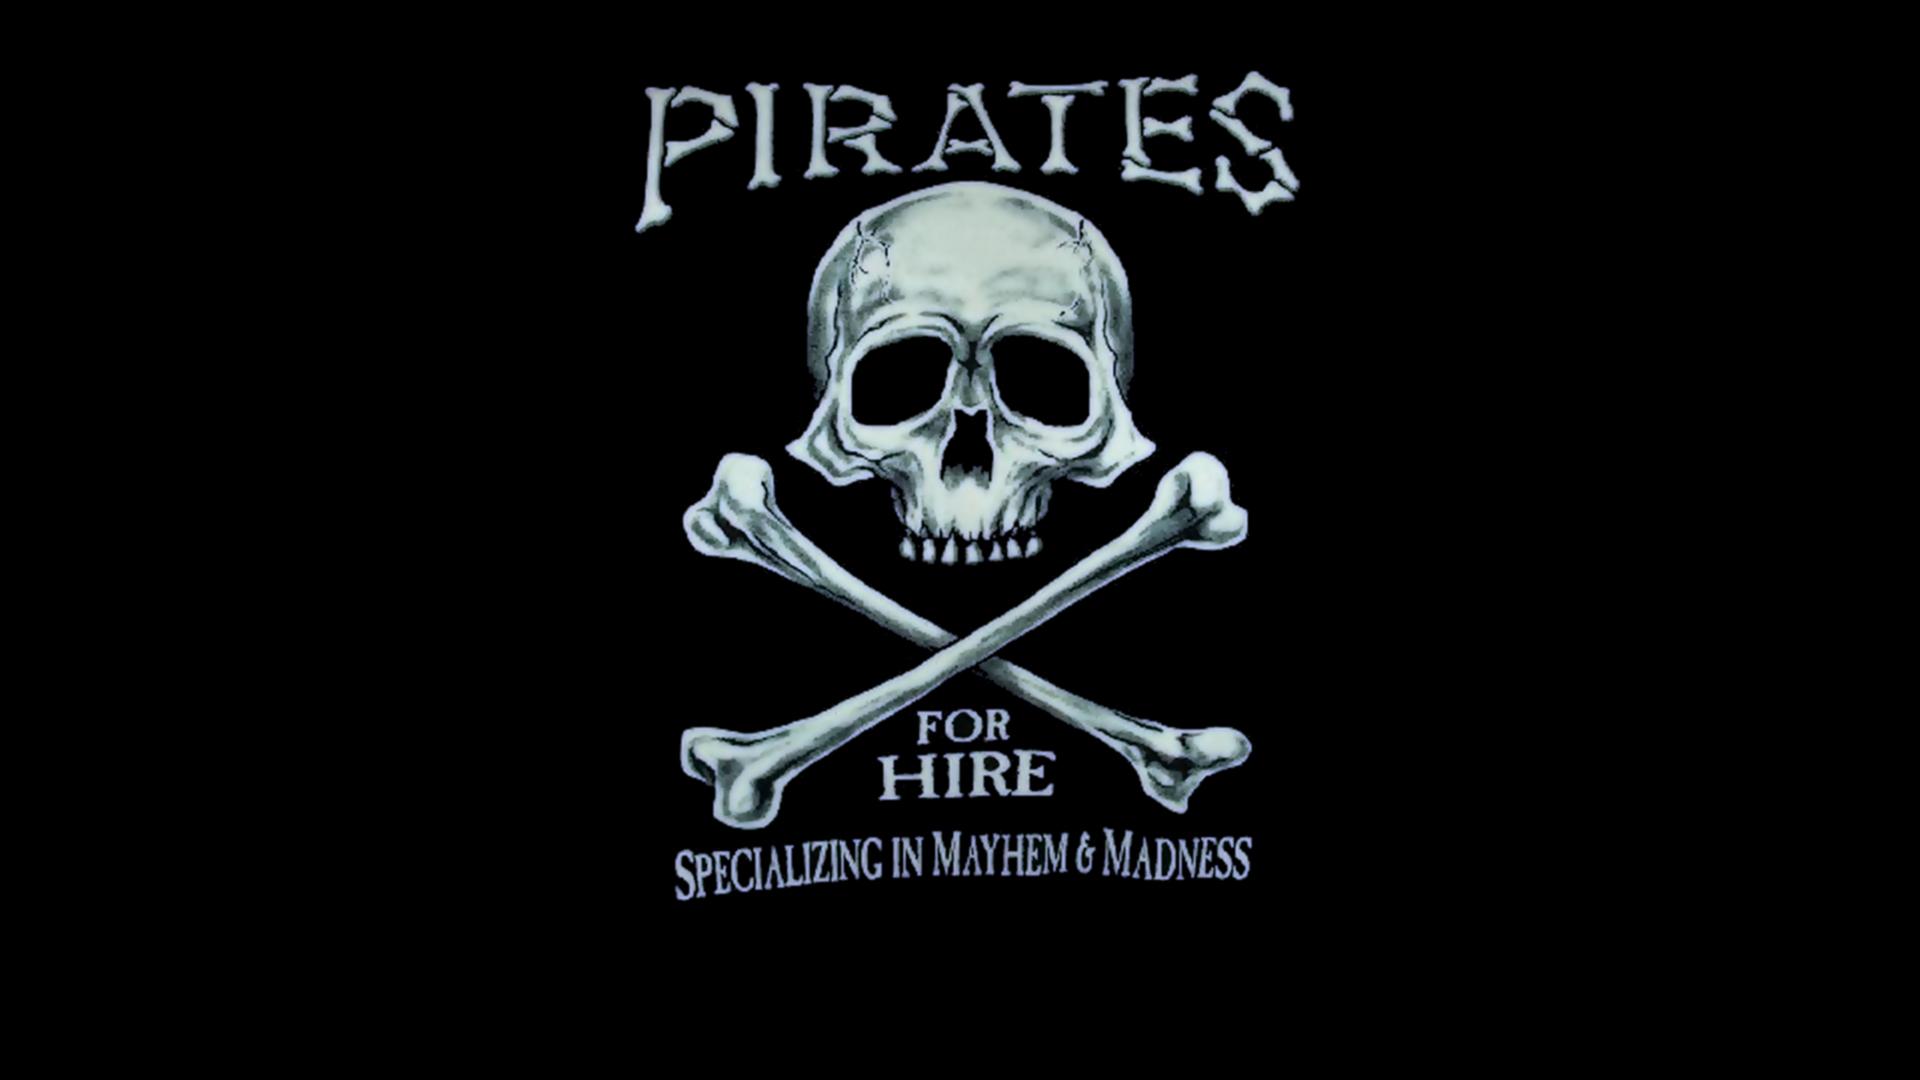 Pirates Wallpaper 1920x1080 Pirates